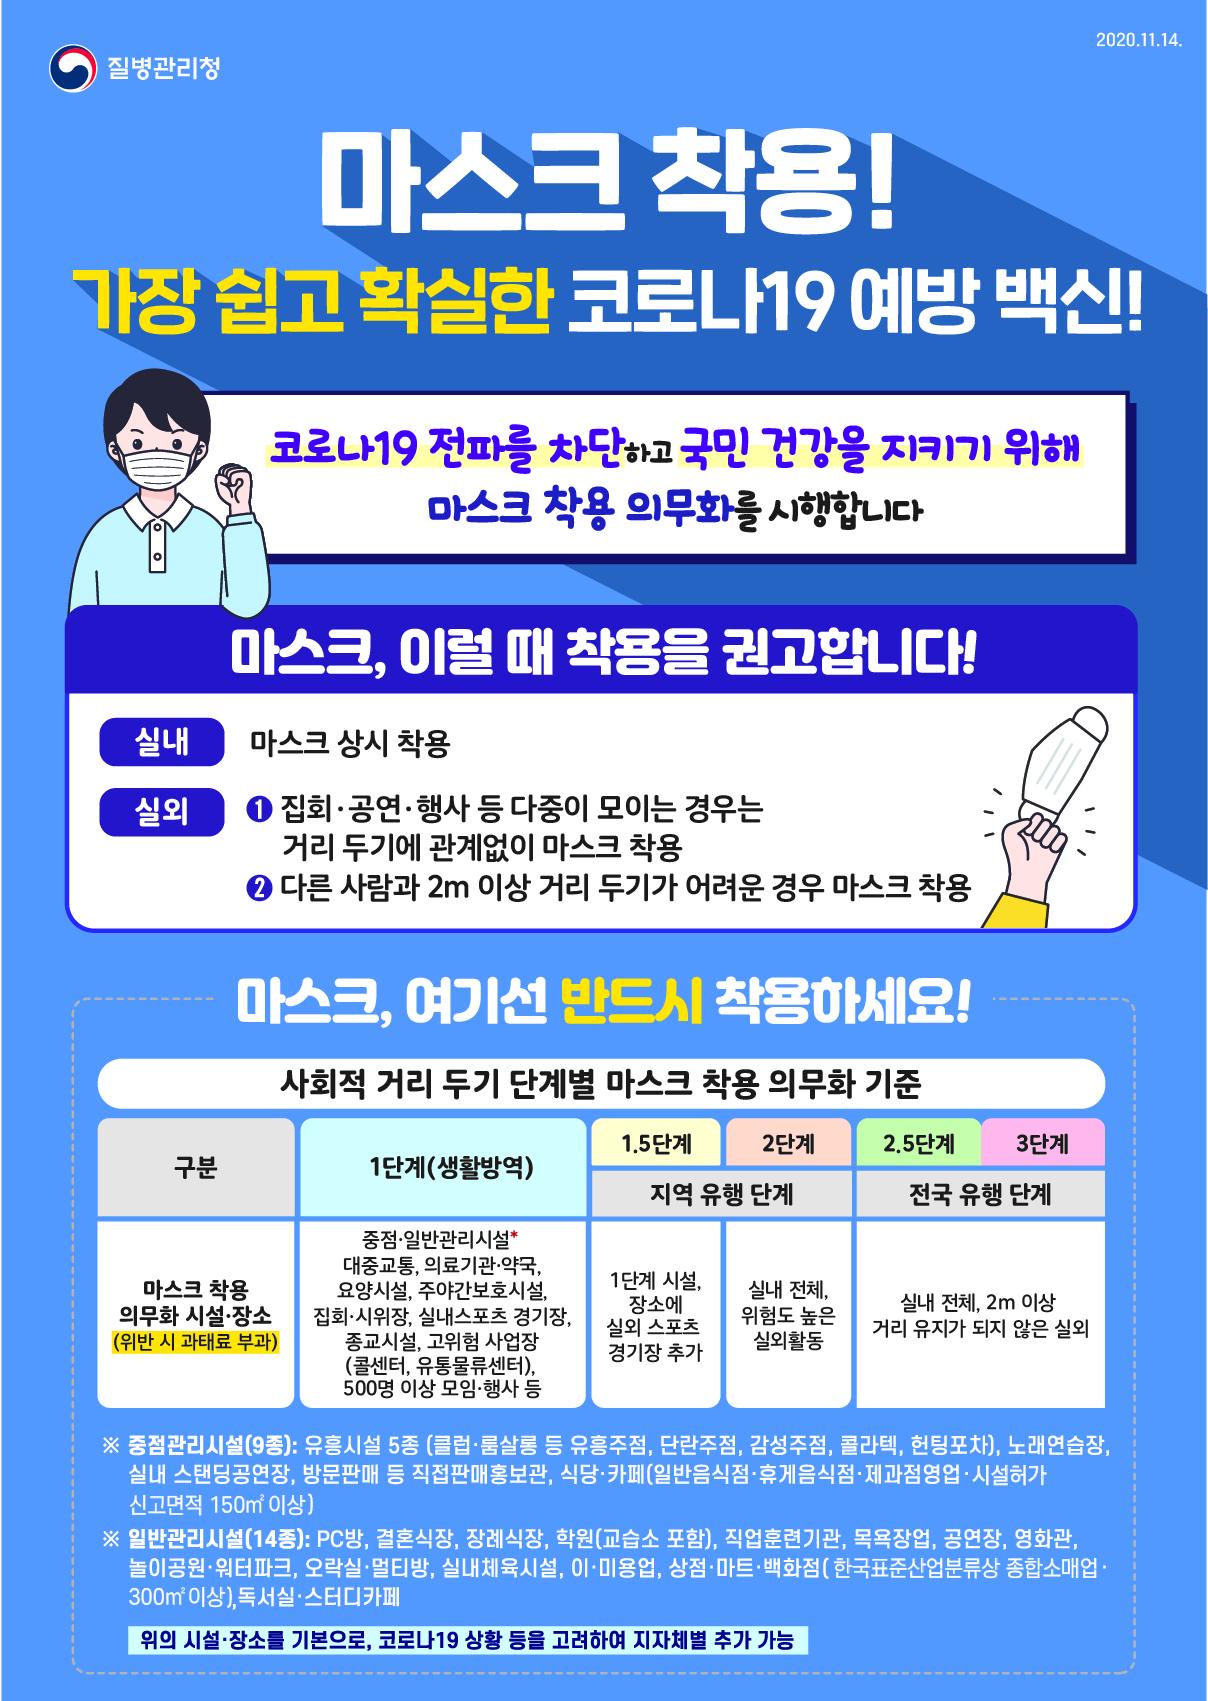 [KDCA]201114_마스크 착용 의무화 포스터_1.jpg